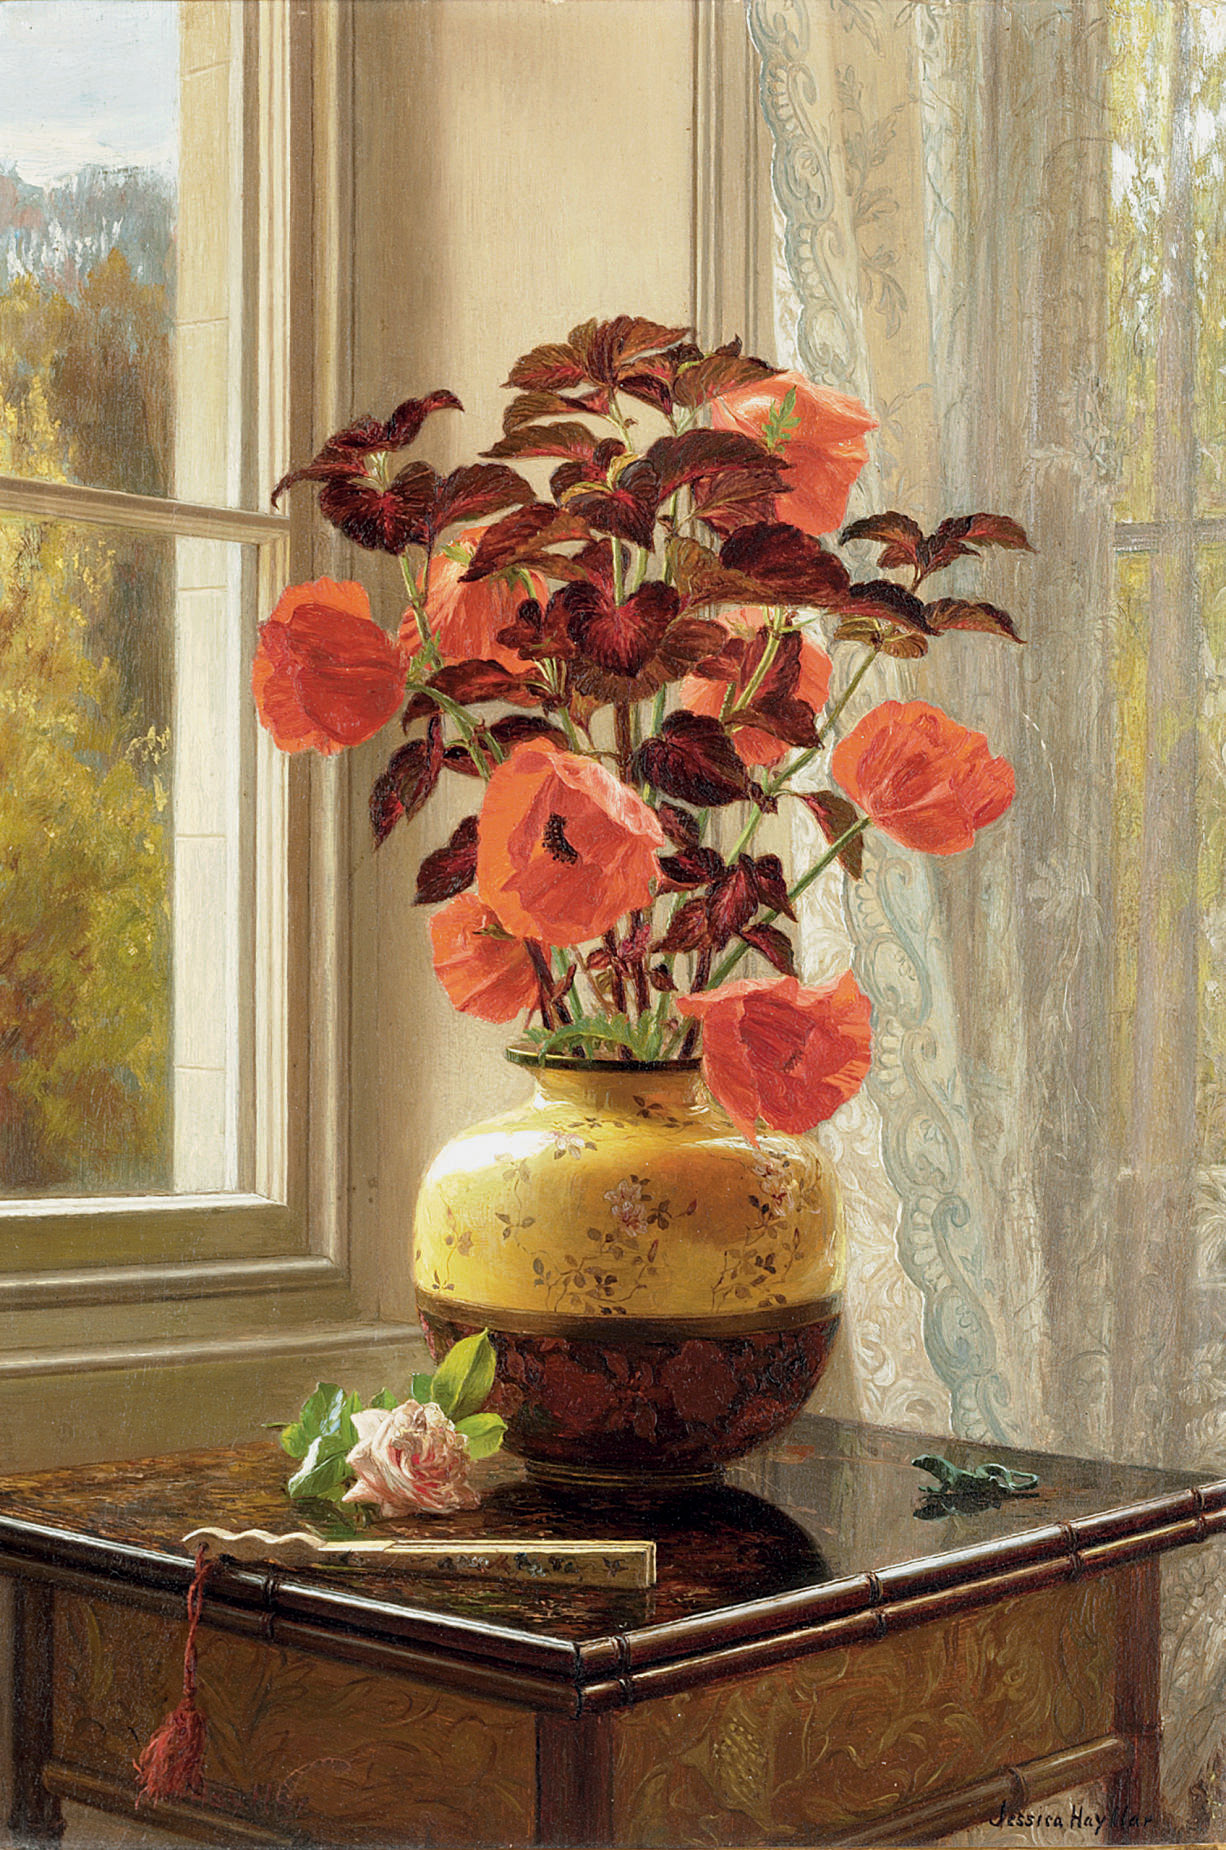 Jessica Hayllar (1858-1940)